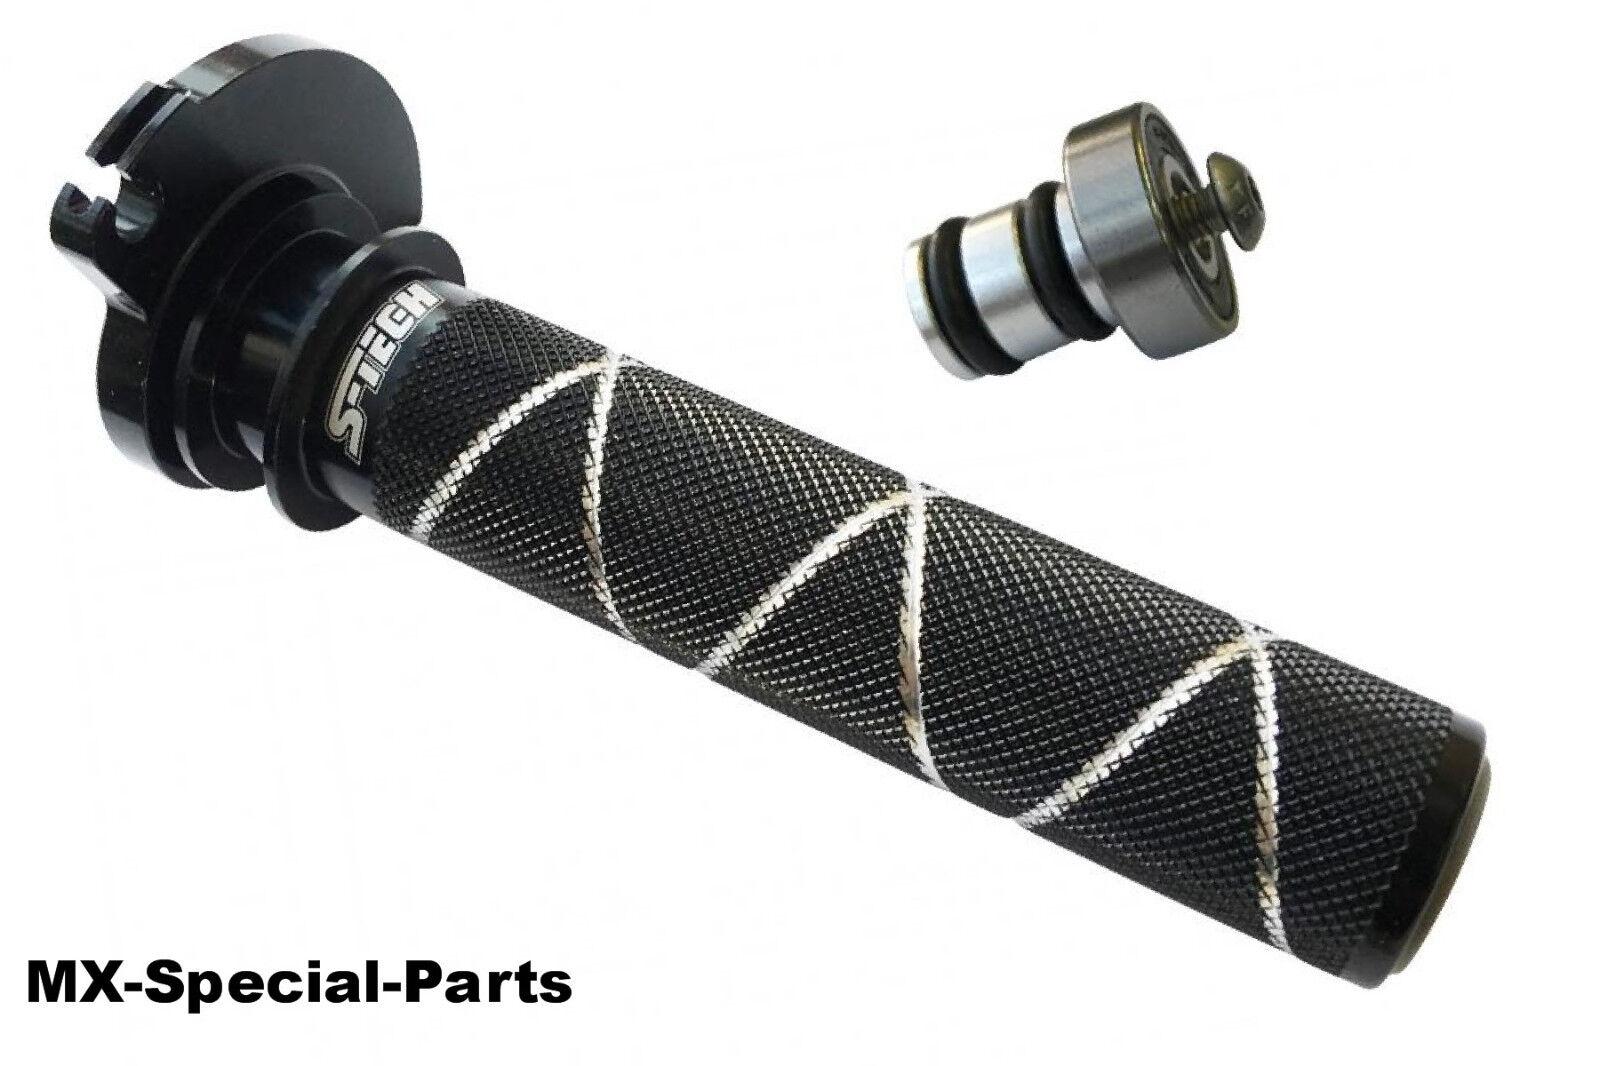 Twist Grip Thredtle Sleeve KTM SX 250 Aluminium+Teflon Sleeve+